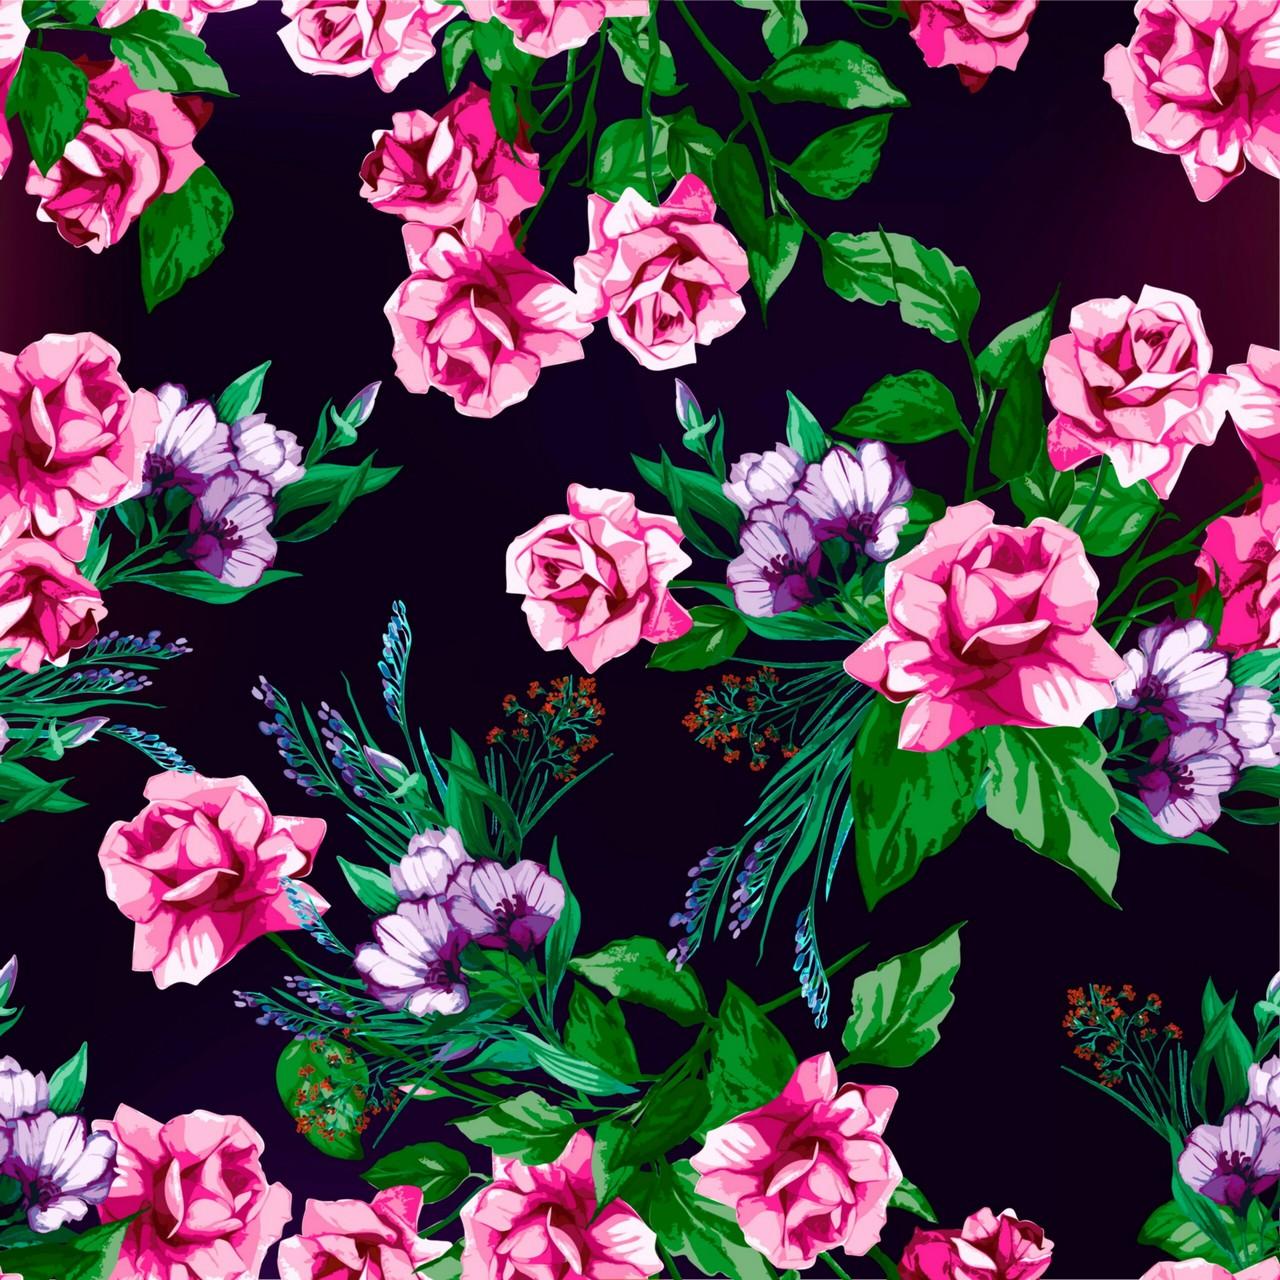 floral background ogq backgrounds hd - Floral Backgrounds